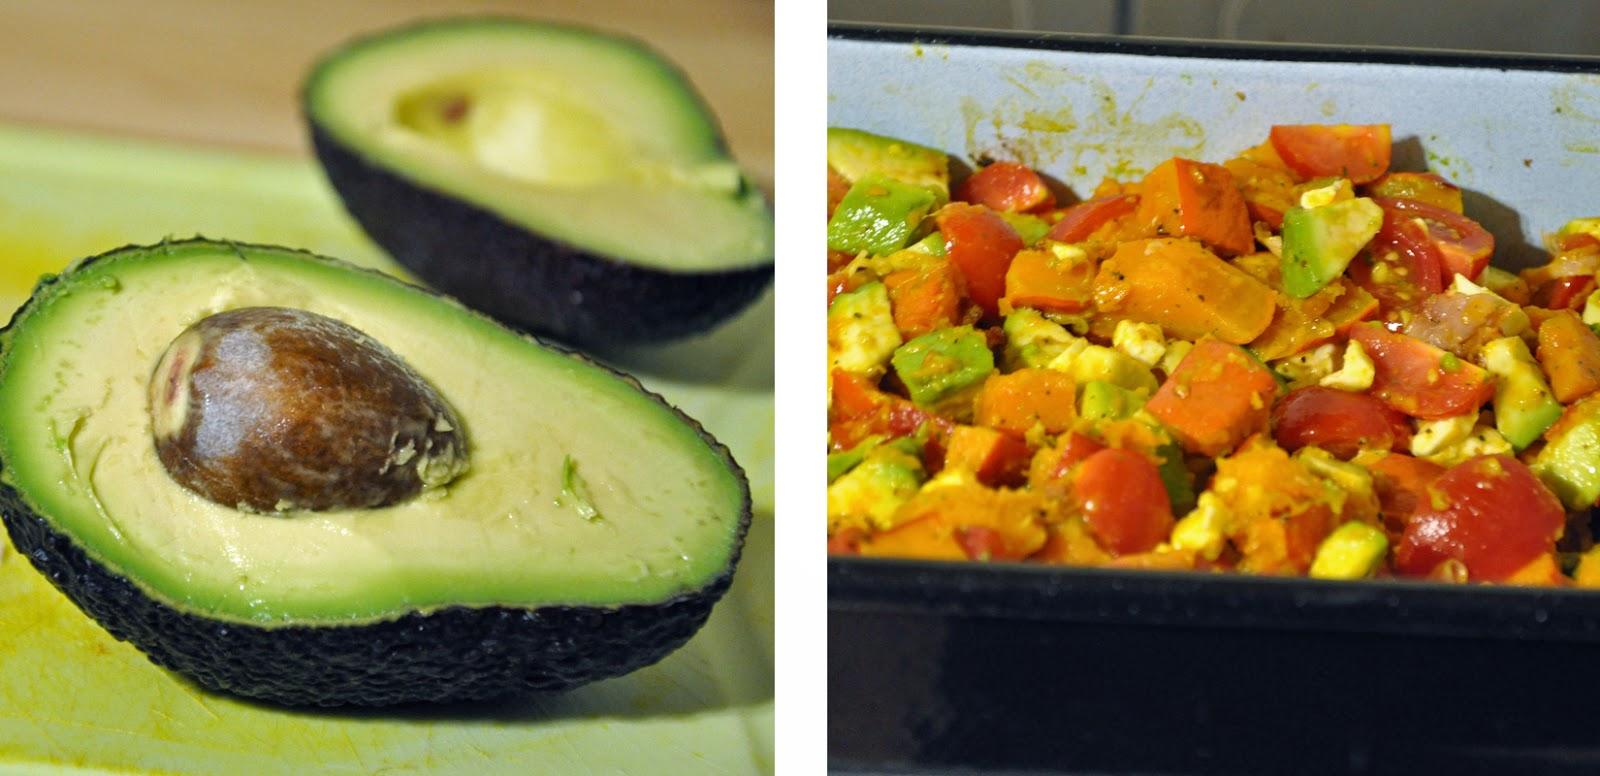 Kürbis-Caprese deluxe | Avocado, Tomaten, Mozzarella und Marinade zum gebackenen Kürbis geben